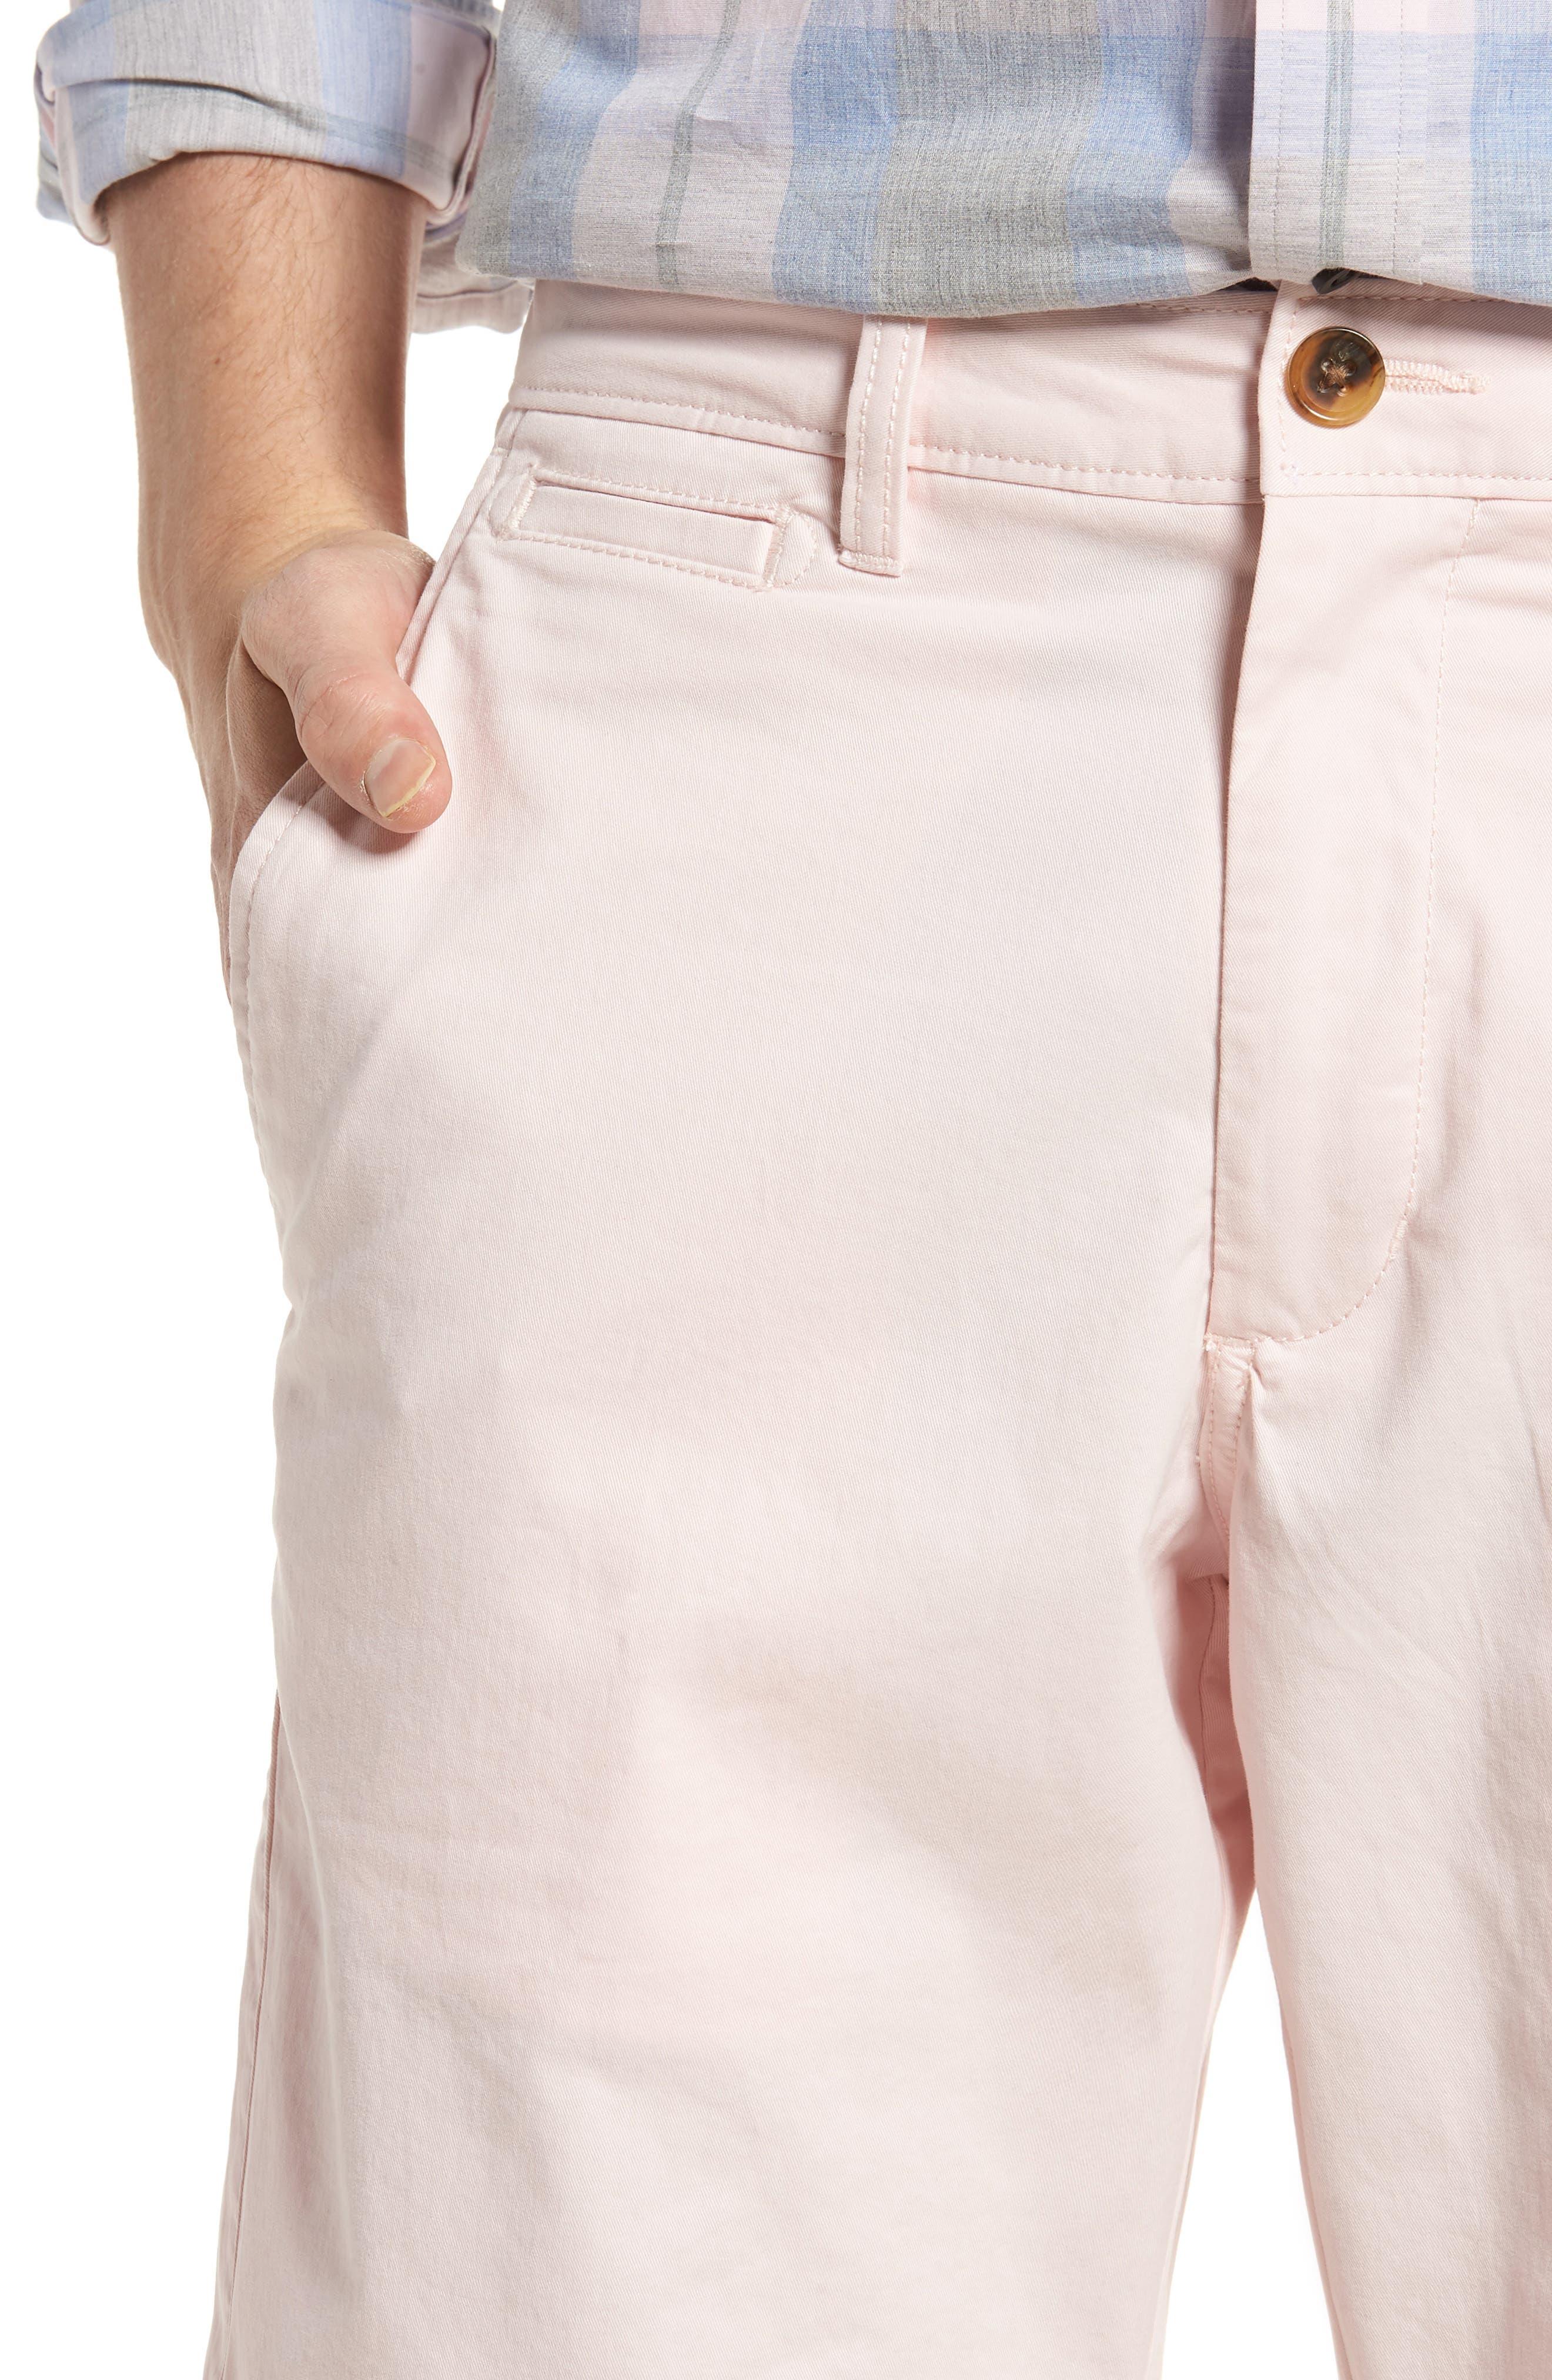 Ballard Slim Fit Stretch Chino 11-Inch Shorts,                             Alternate thumbnail 63, color,